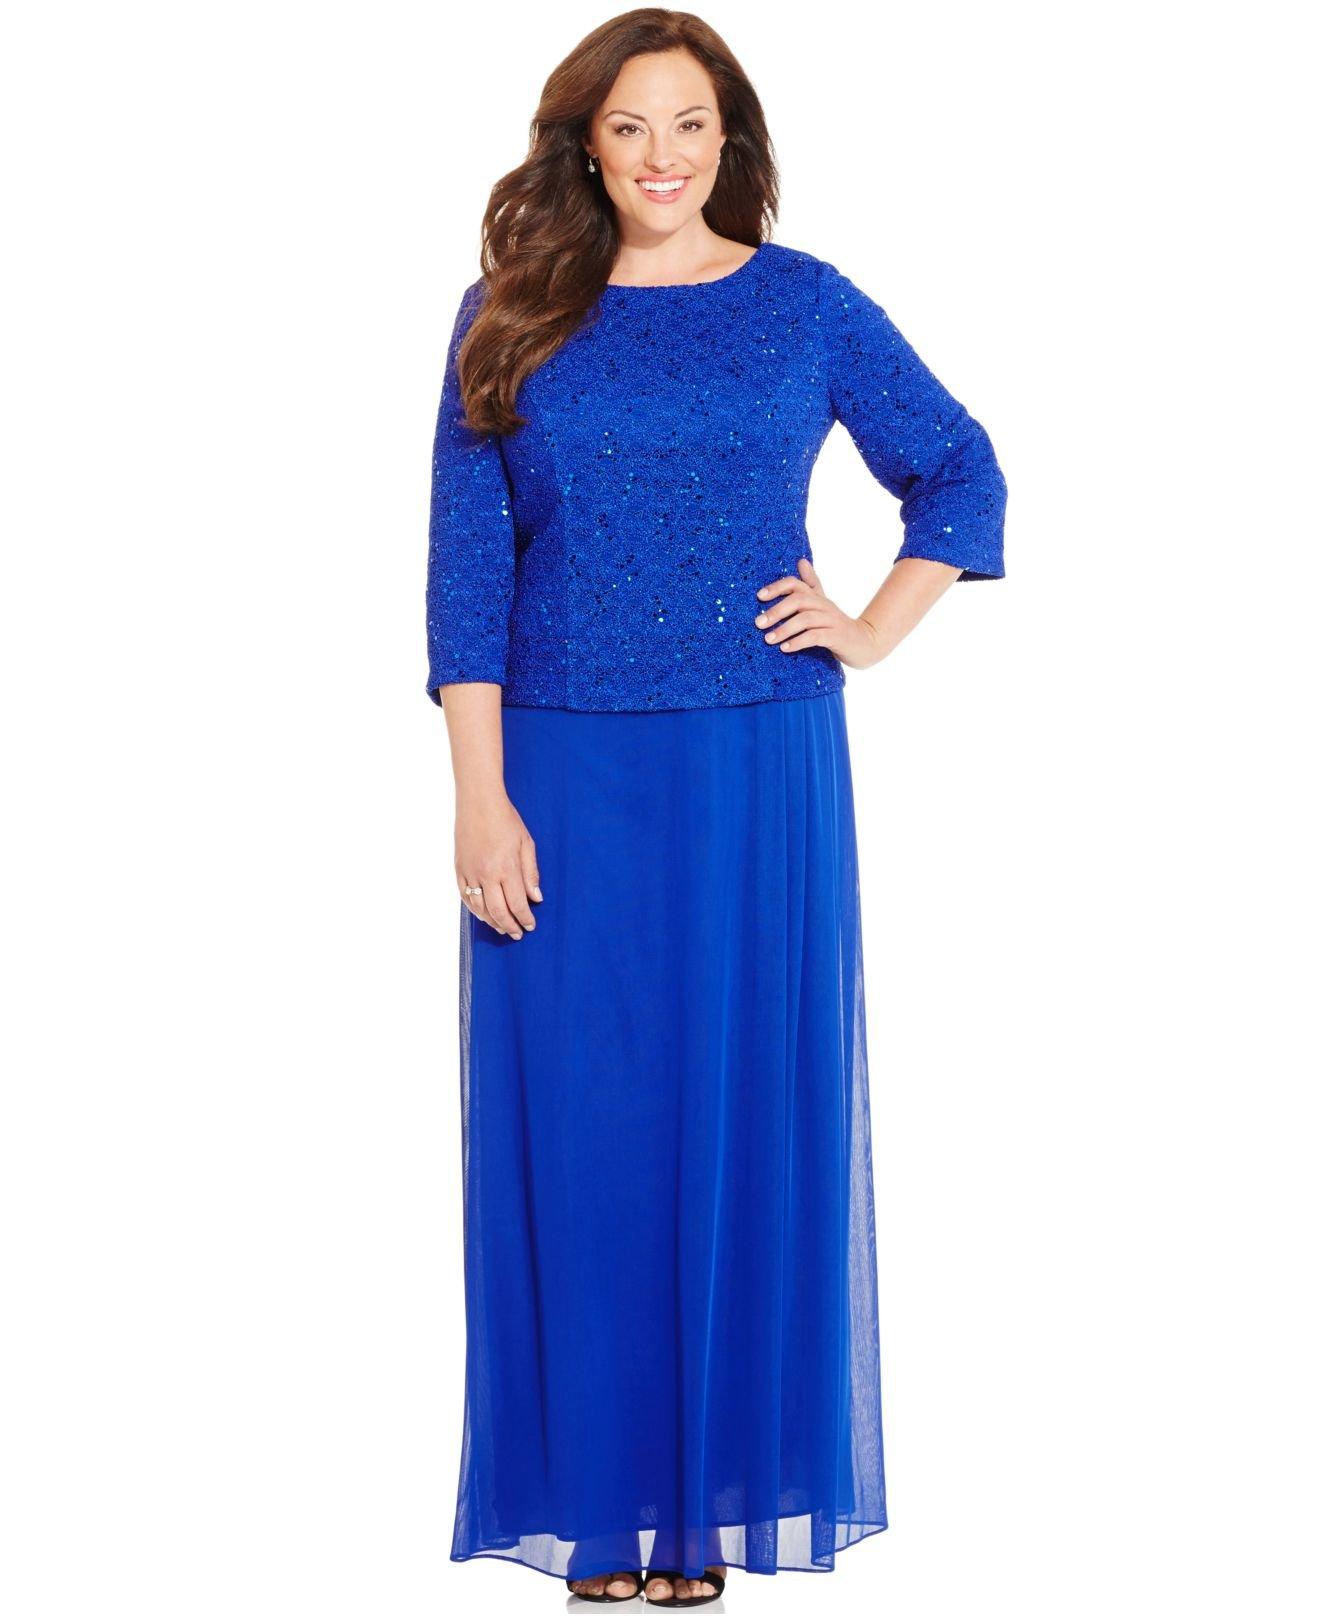 alex evenings plus size dress - gaussianblur